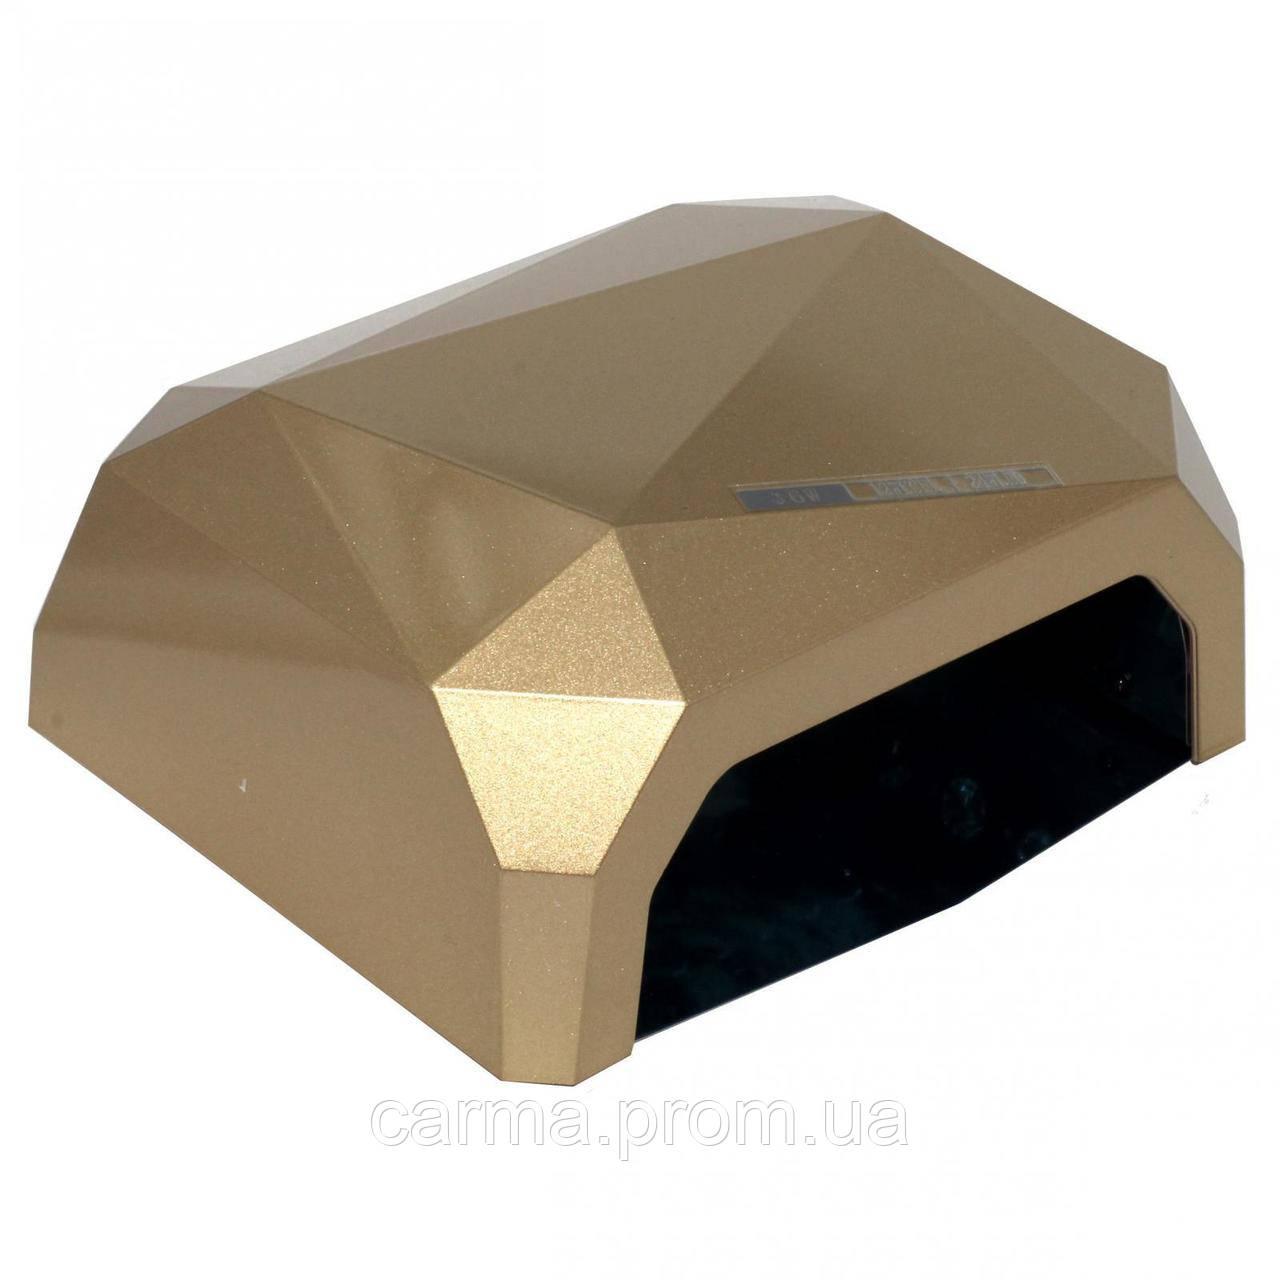 Лампа для маникюра гибридная DIAMOND CCFL+LED 36W Золотая